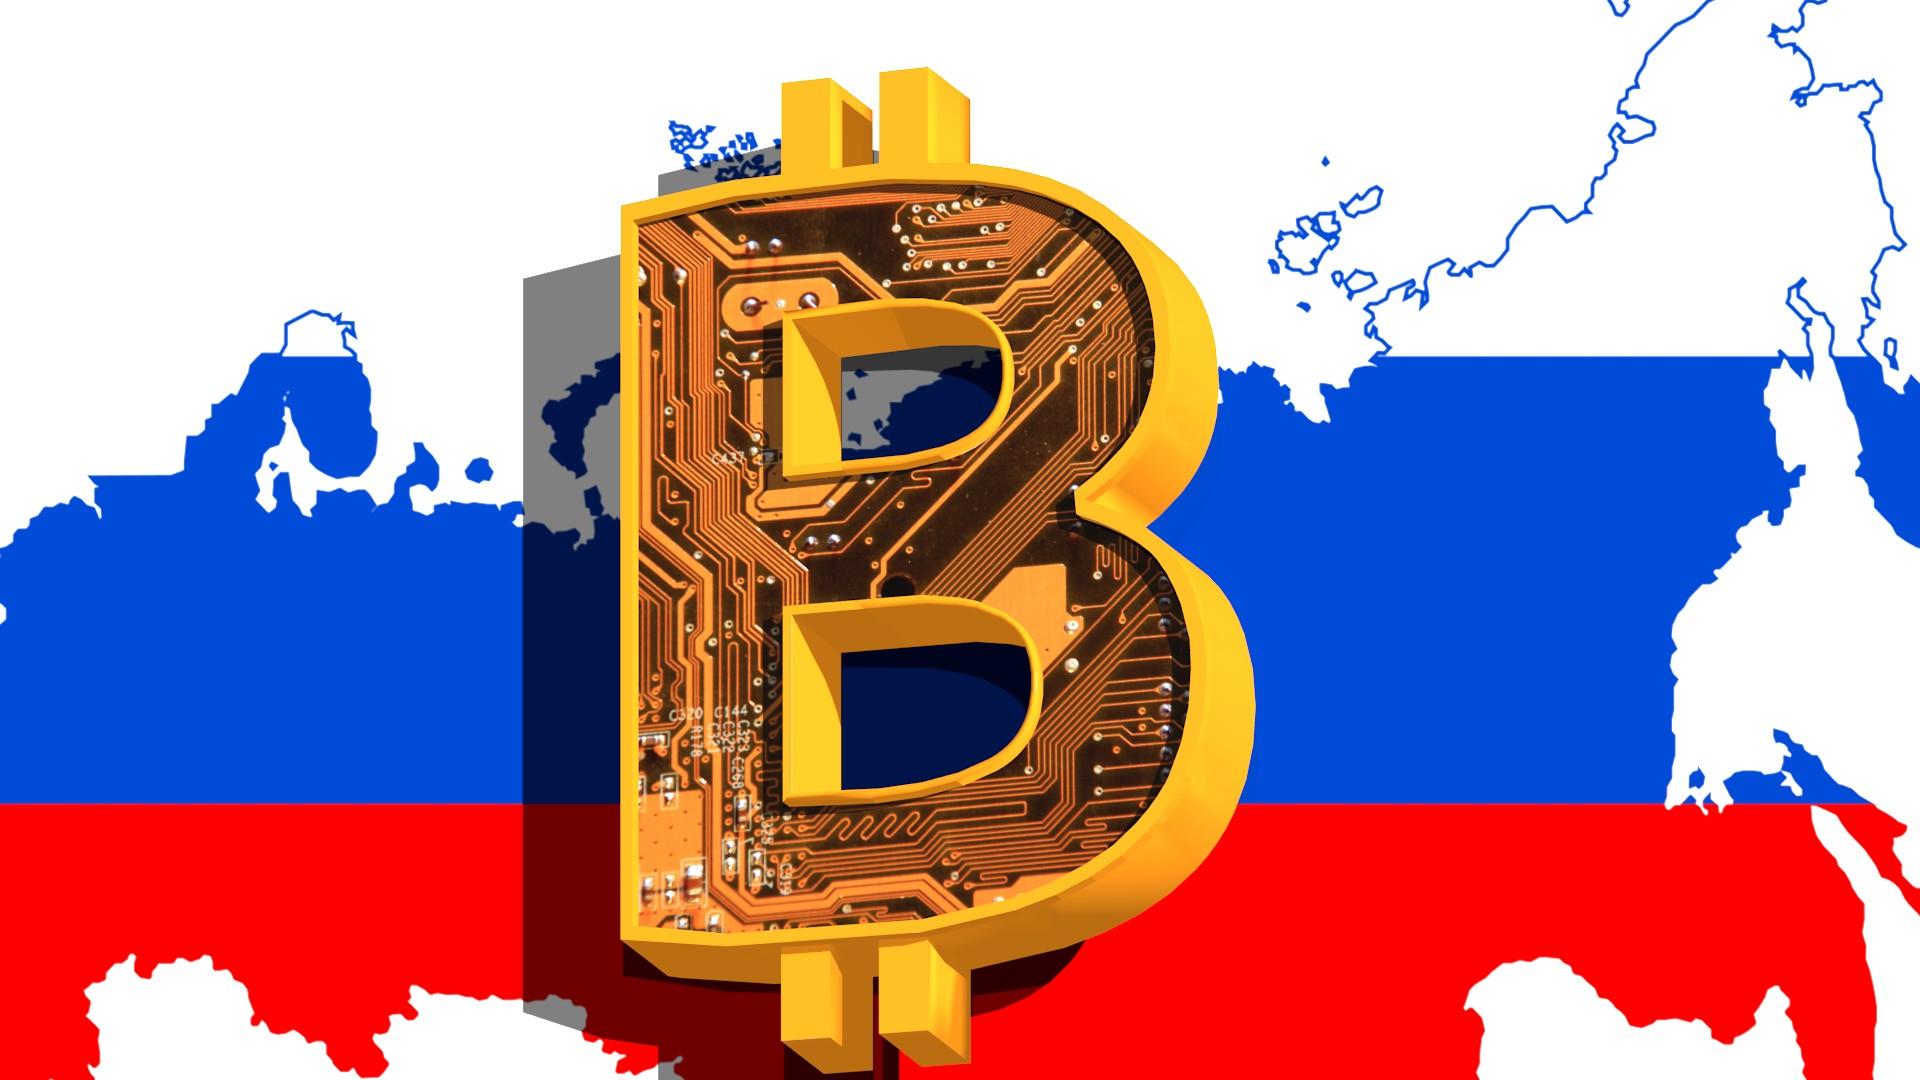 Биткоин на фоне российского флага